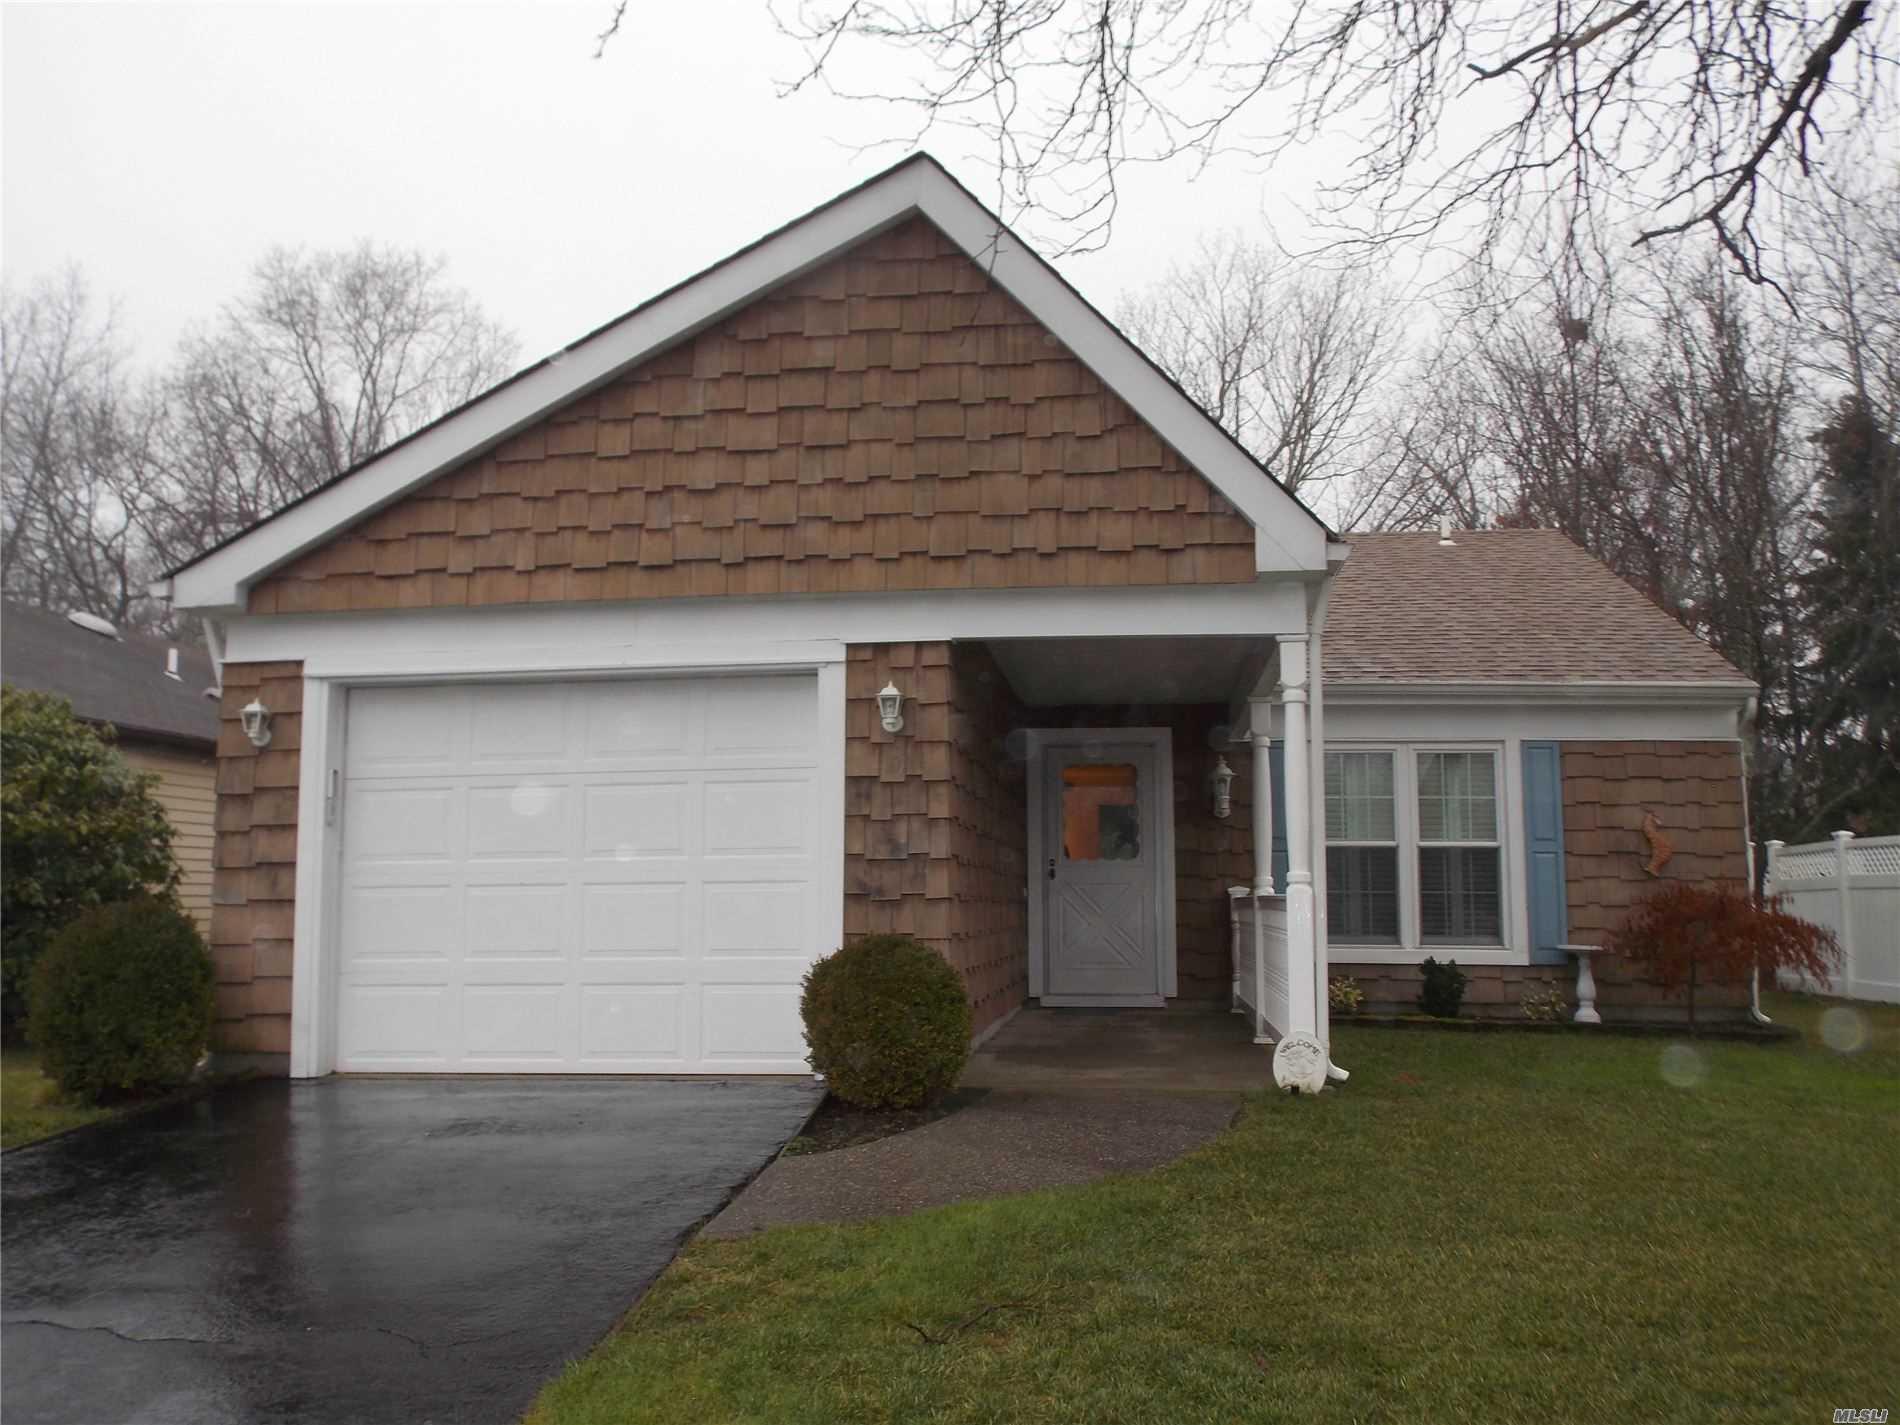 Property for sale at 5 Lamont Road, Ridge NY 11961, Ridge,  New York 11961